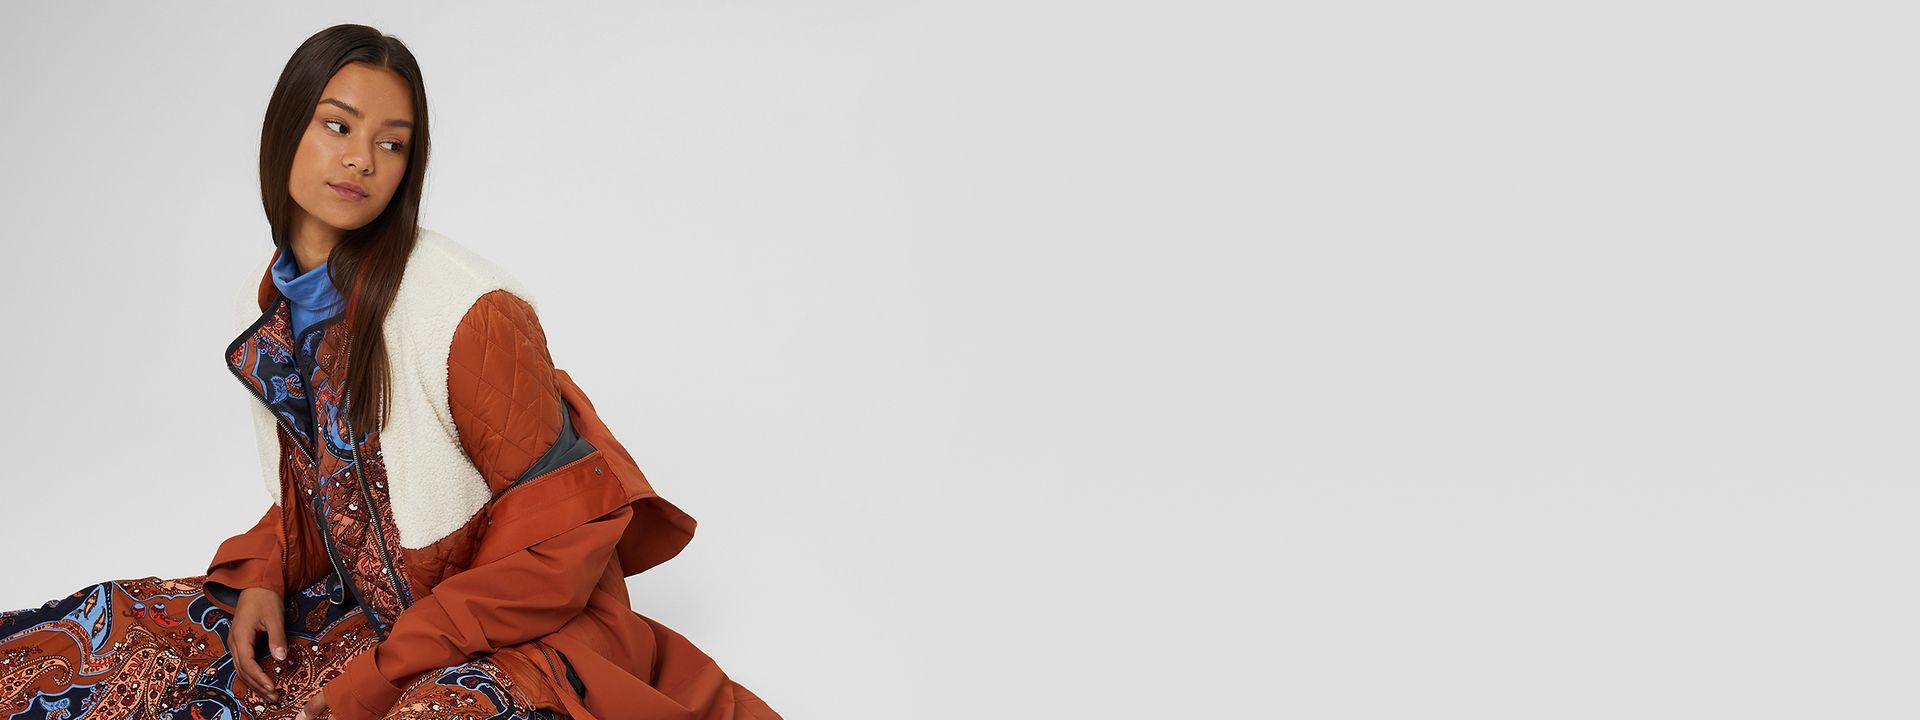 182021 - women - startpage - main banner - pants - IMG